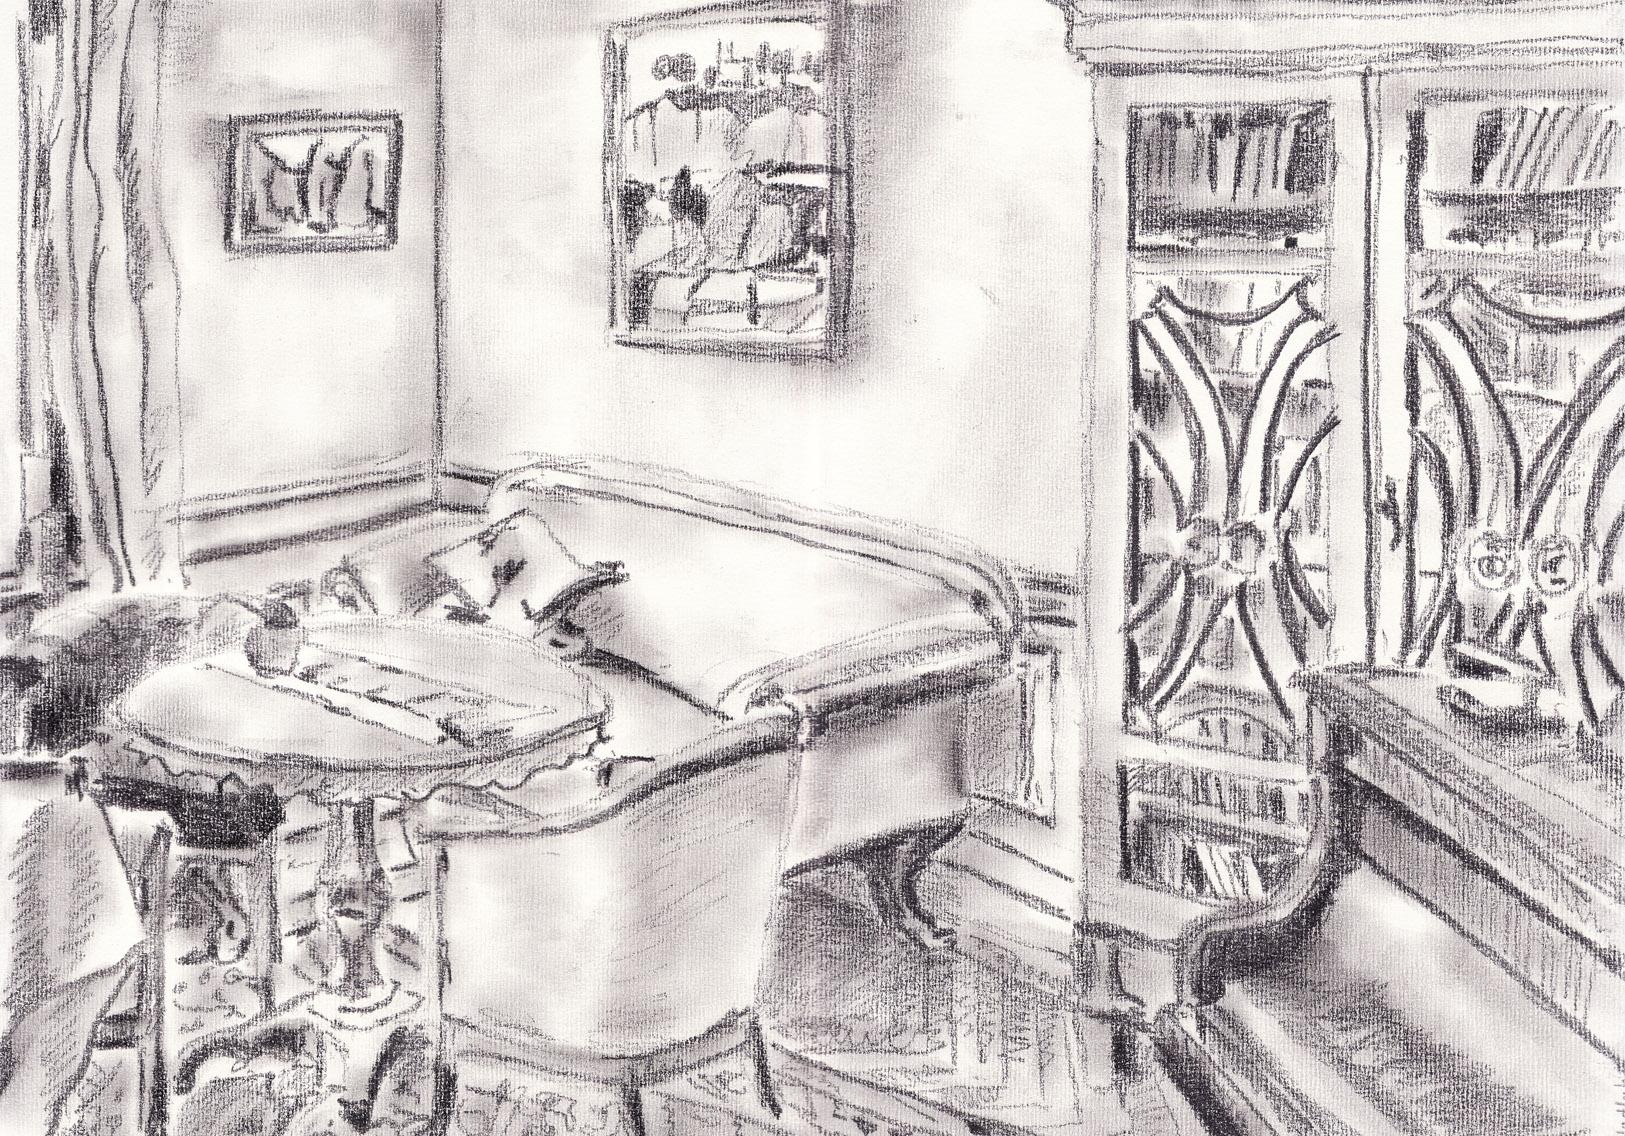 Wohnzimmer 2. Daniel Hartlaub. Pop-Up Gallery Wiesenau. Pencil on paper. 42.0 x 29.7cm